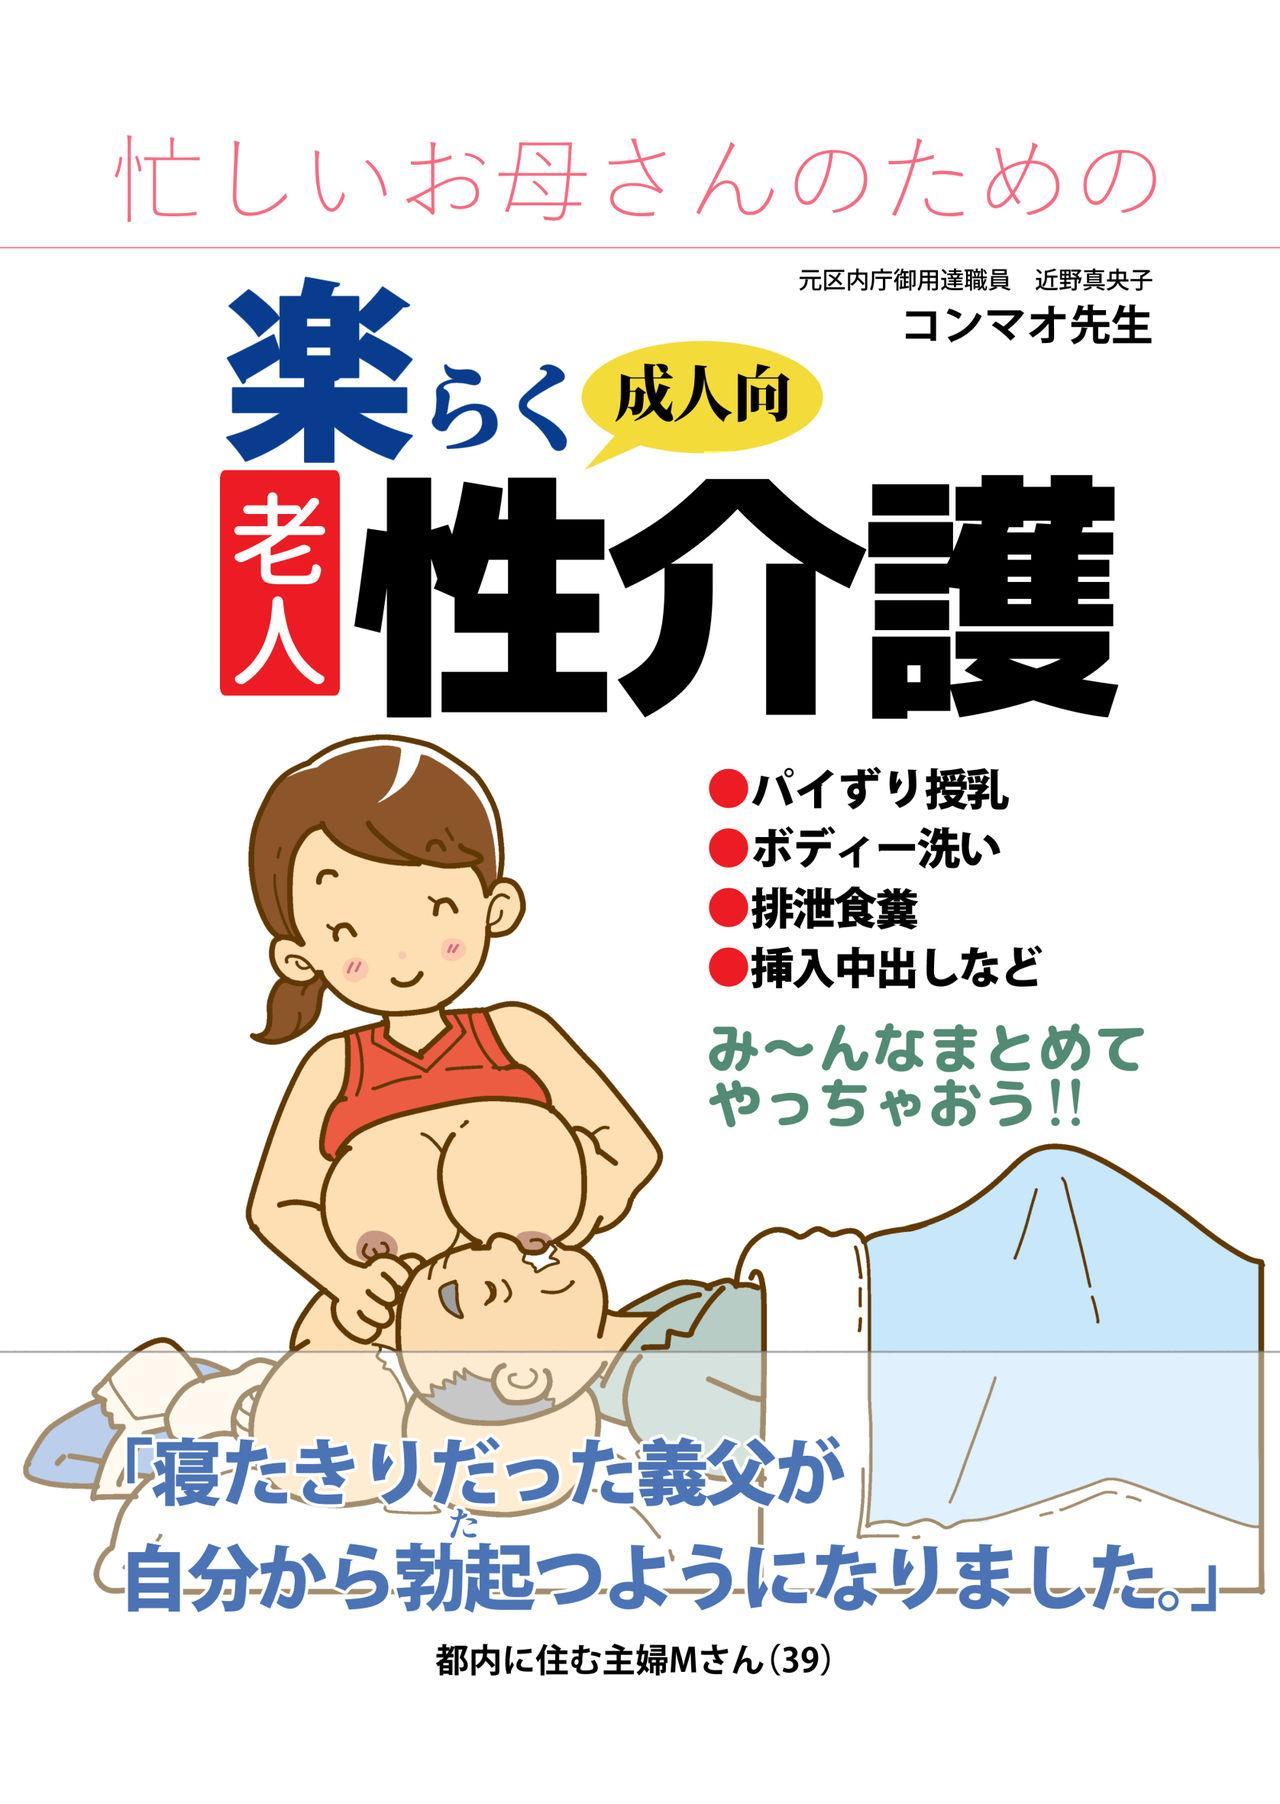 Isogasii Okaasan No Tamuno Sasa Rouzin Seikaigo | Guide for Elderly Sex Health Care to Busy Mom 0